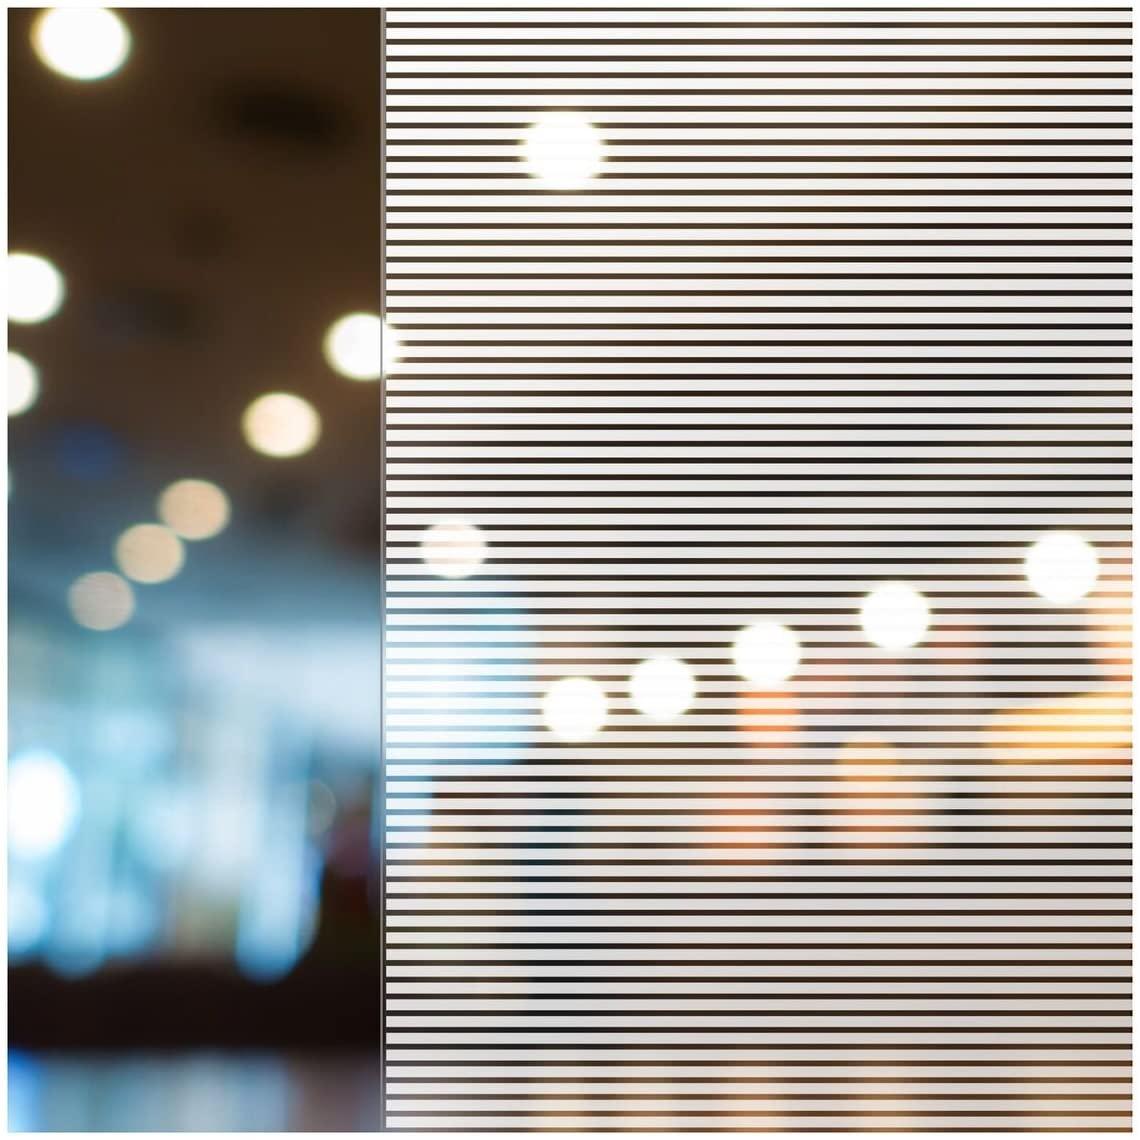 BDF BLM Window Film Mini Blind (1/8 Inch Wide Blinds) - 12